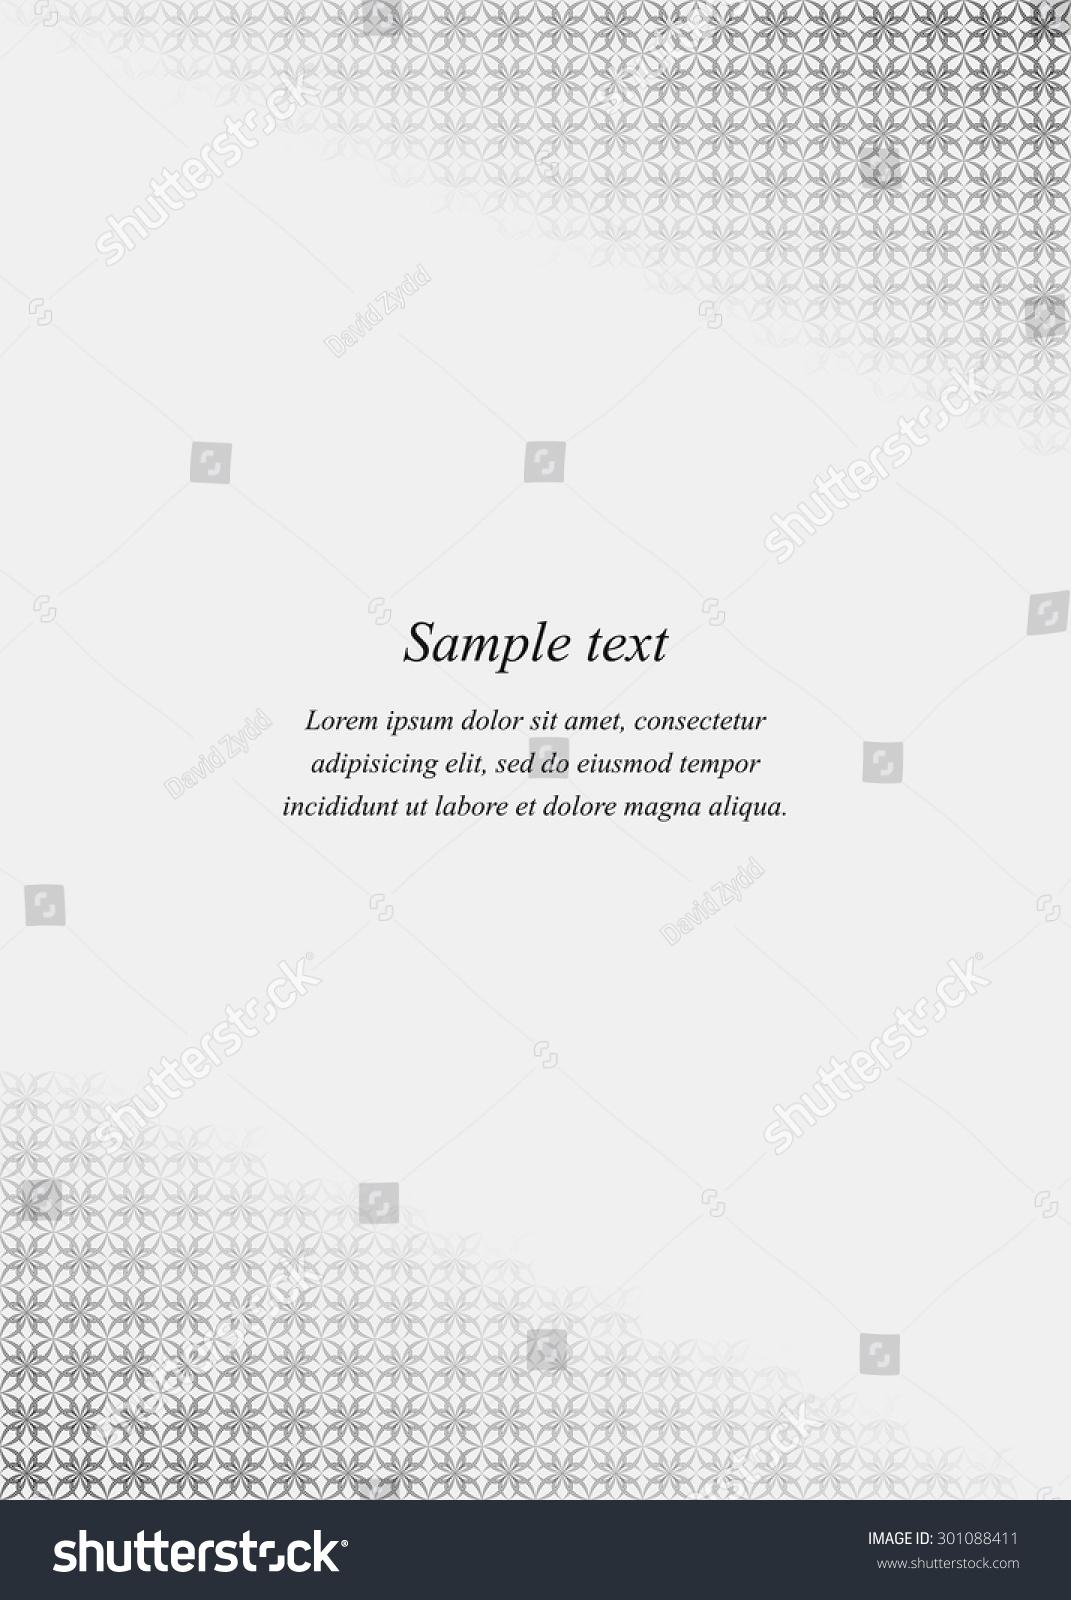 Page corner design template invitation greeting stock vector page corner design template invitation greeting presentation card letter paper stopboris Image collections